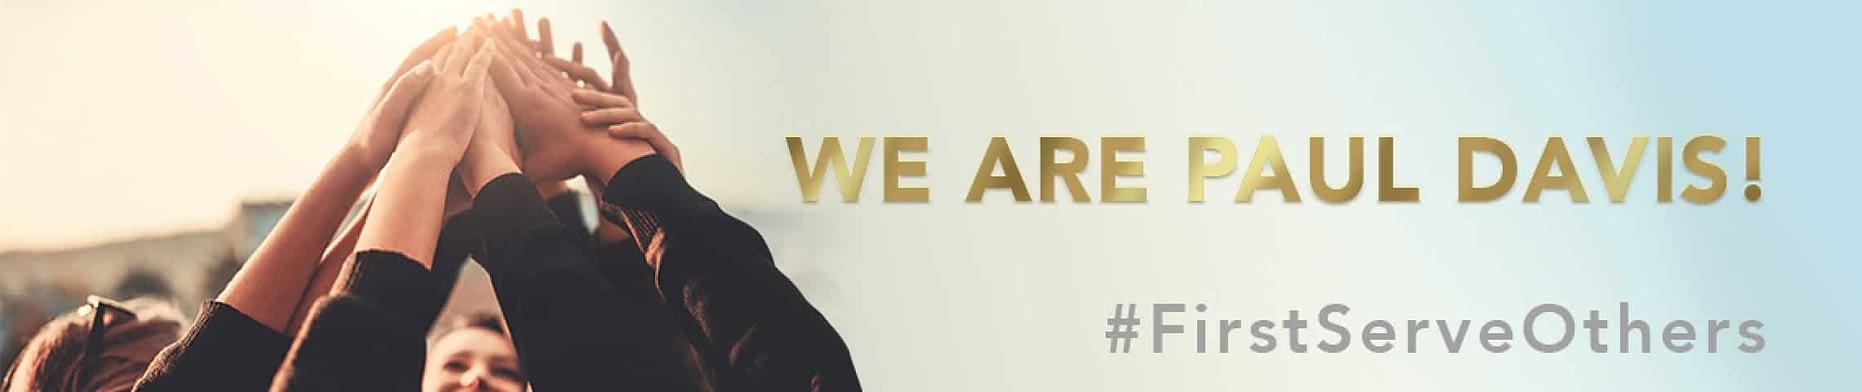 we are paul davis banner